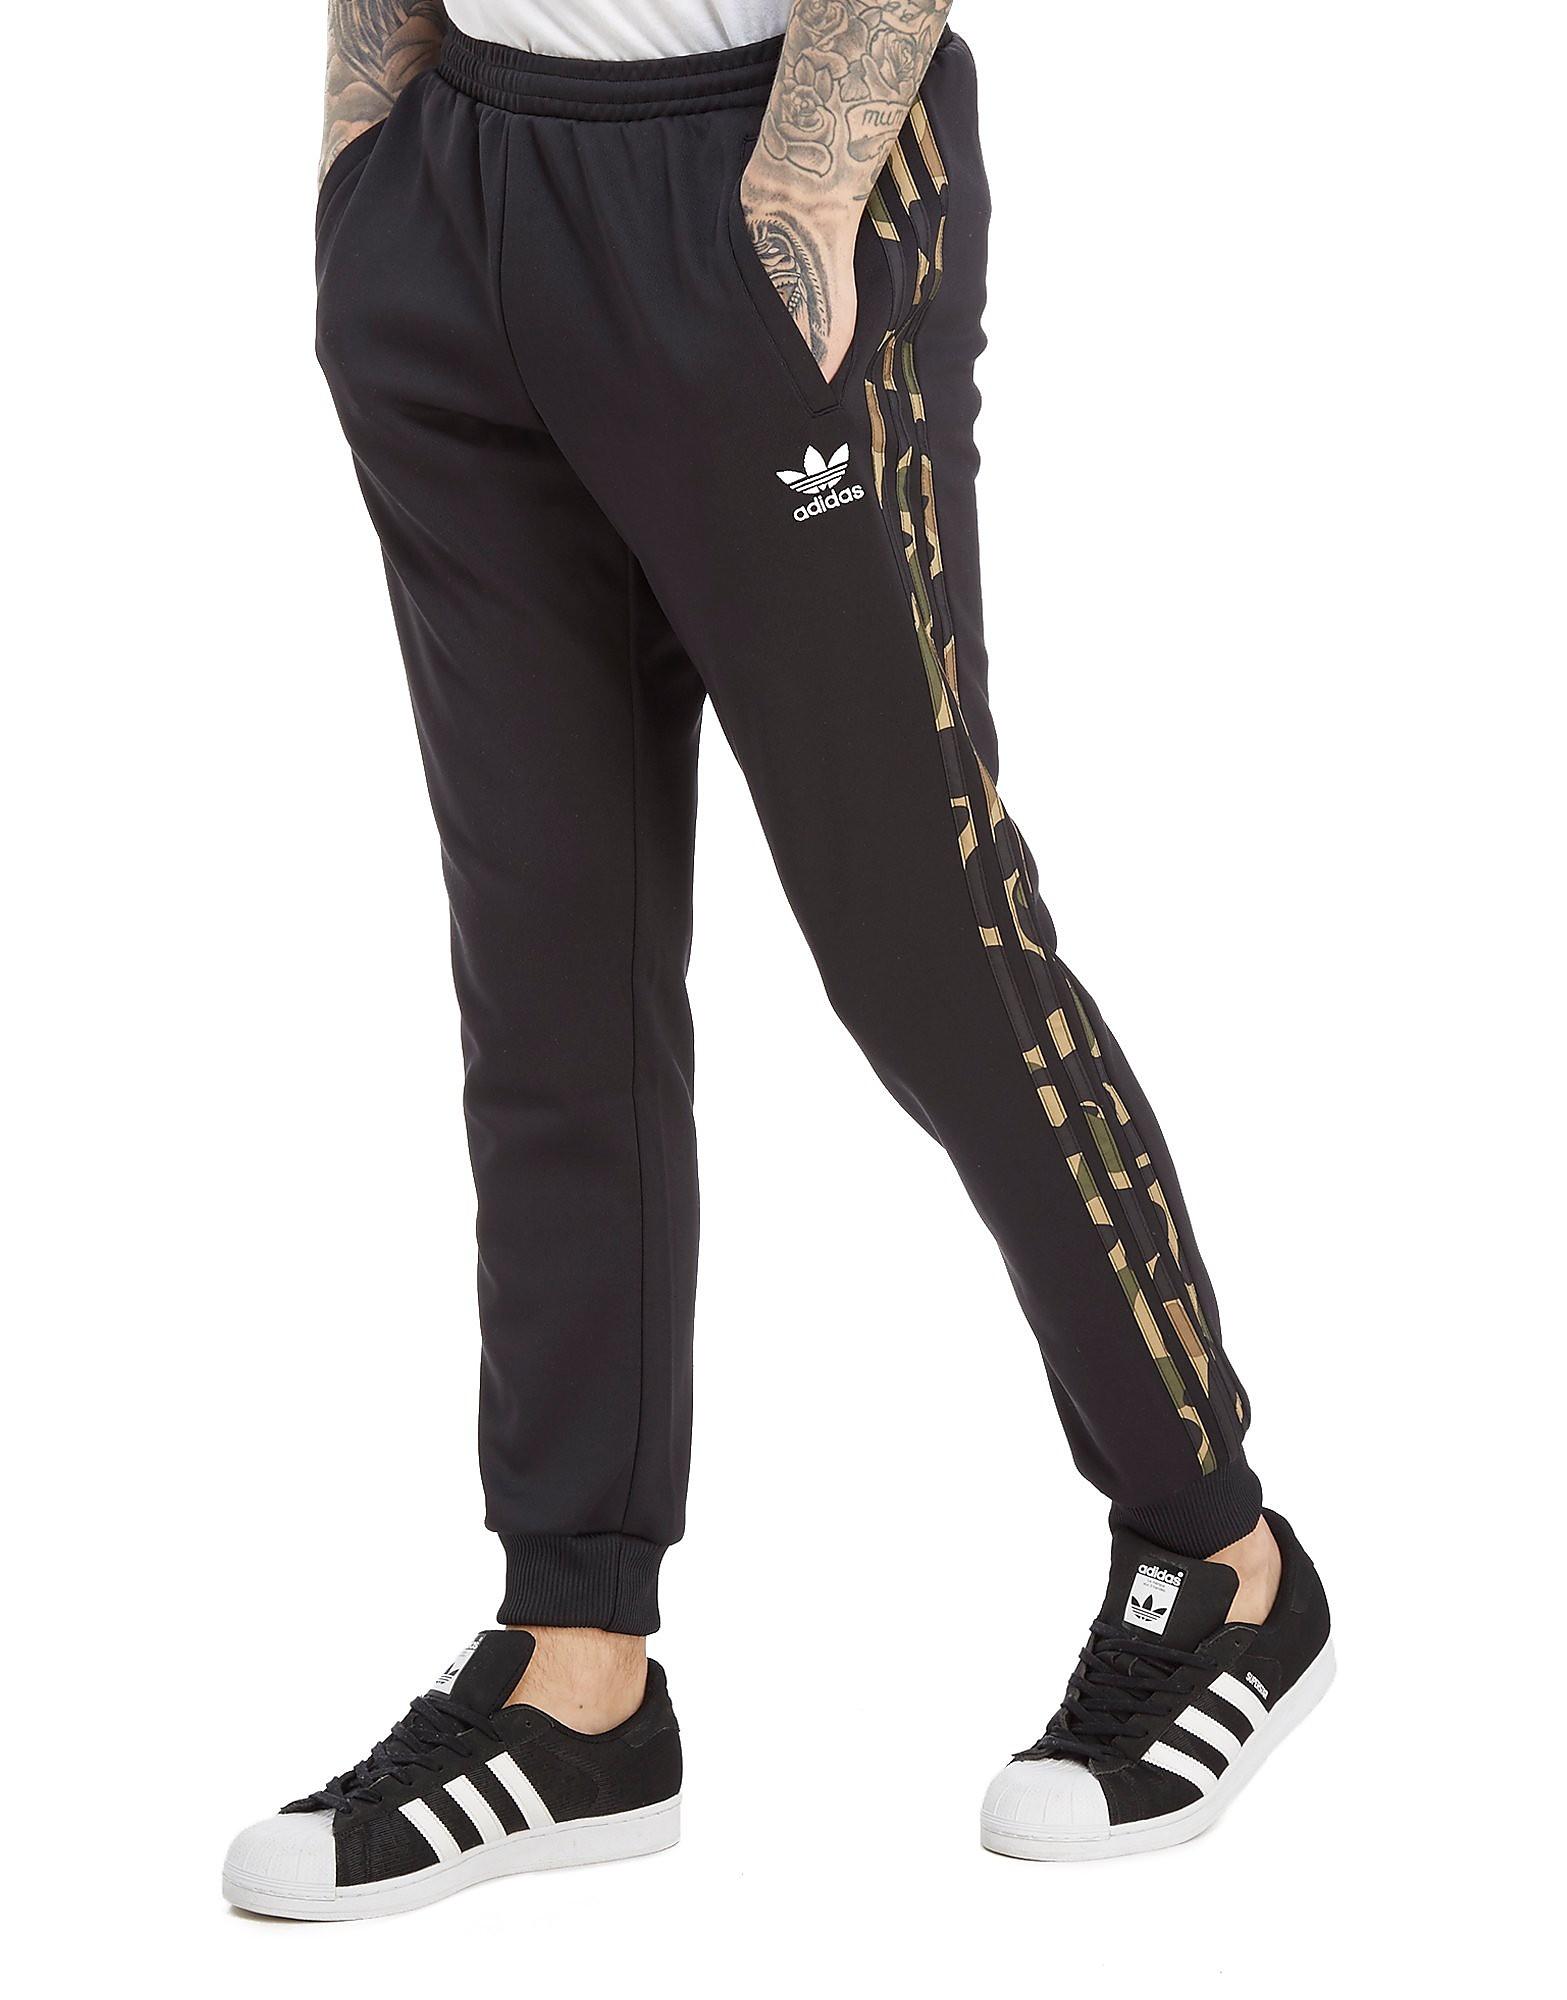 adidas Originals Trefoil Camo Pants